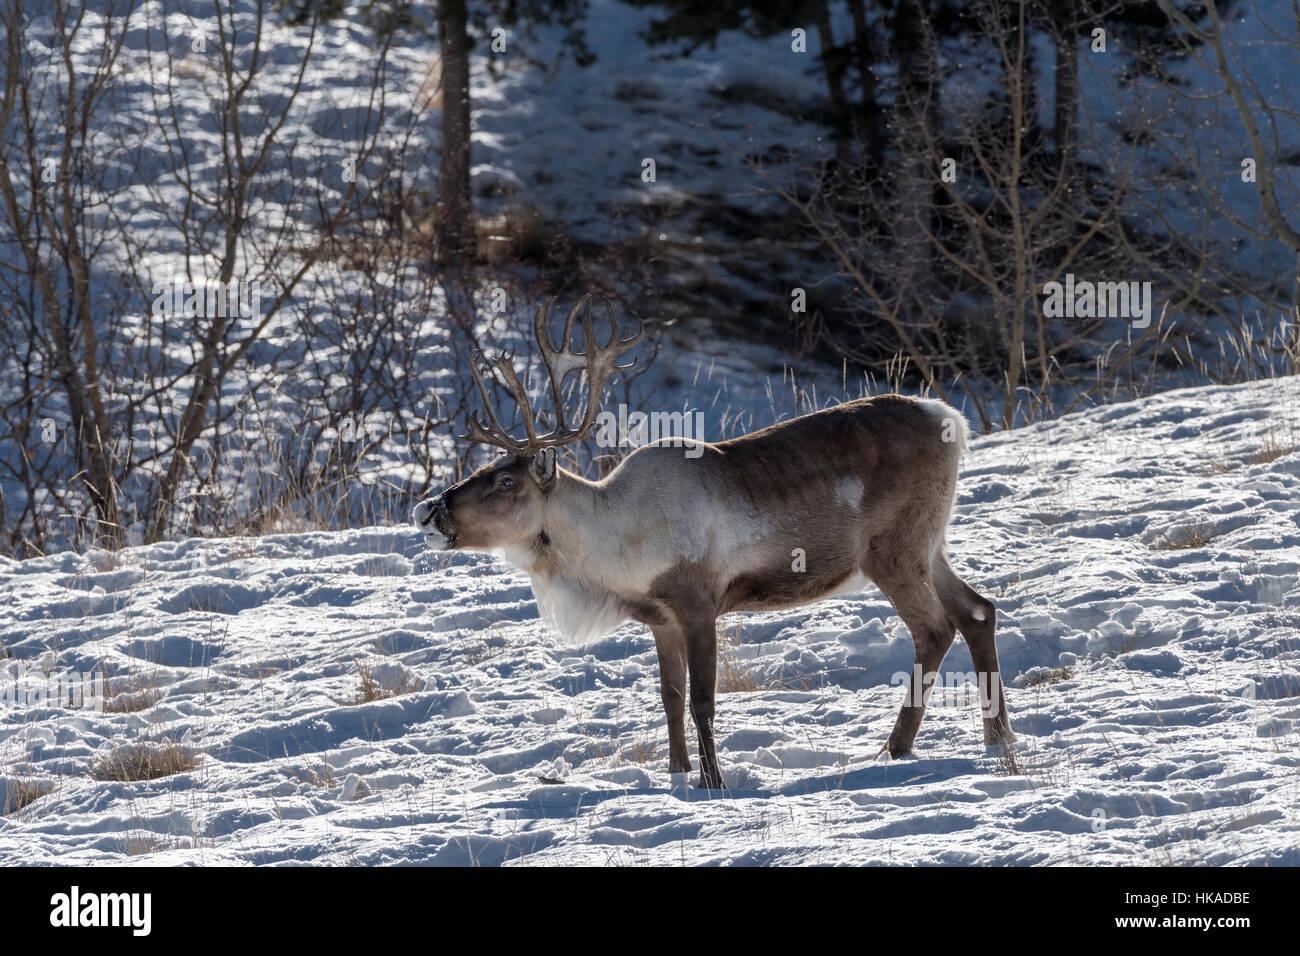 Boreal woodland caribou (Rangifer tarandus, reindeer) with rim light and snow drifting from muzzle, near Whitehorse, - Stock Image